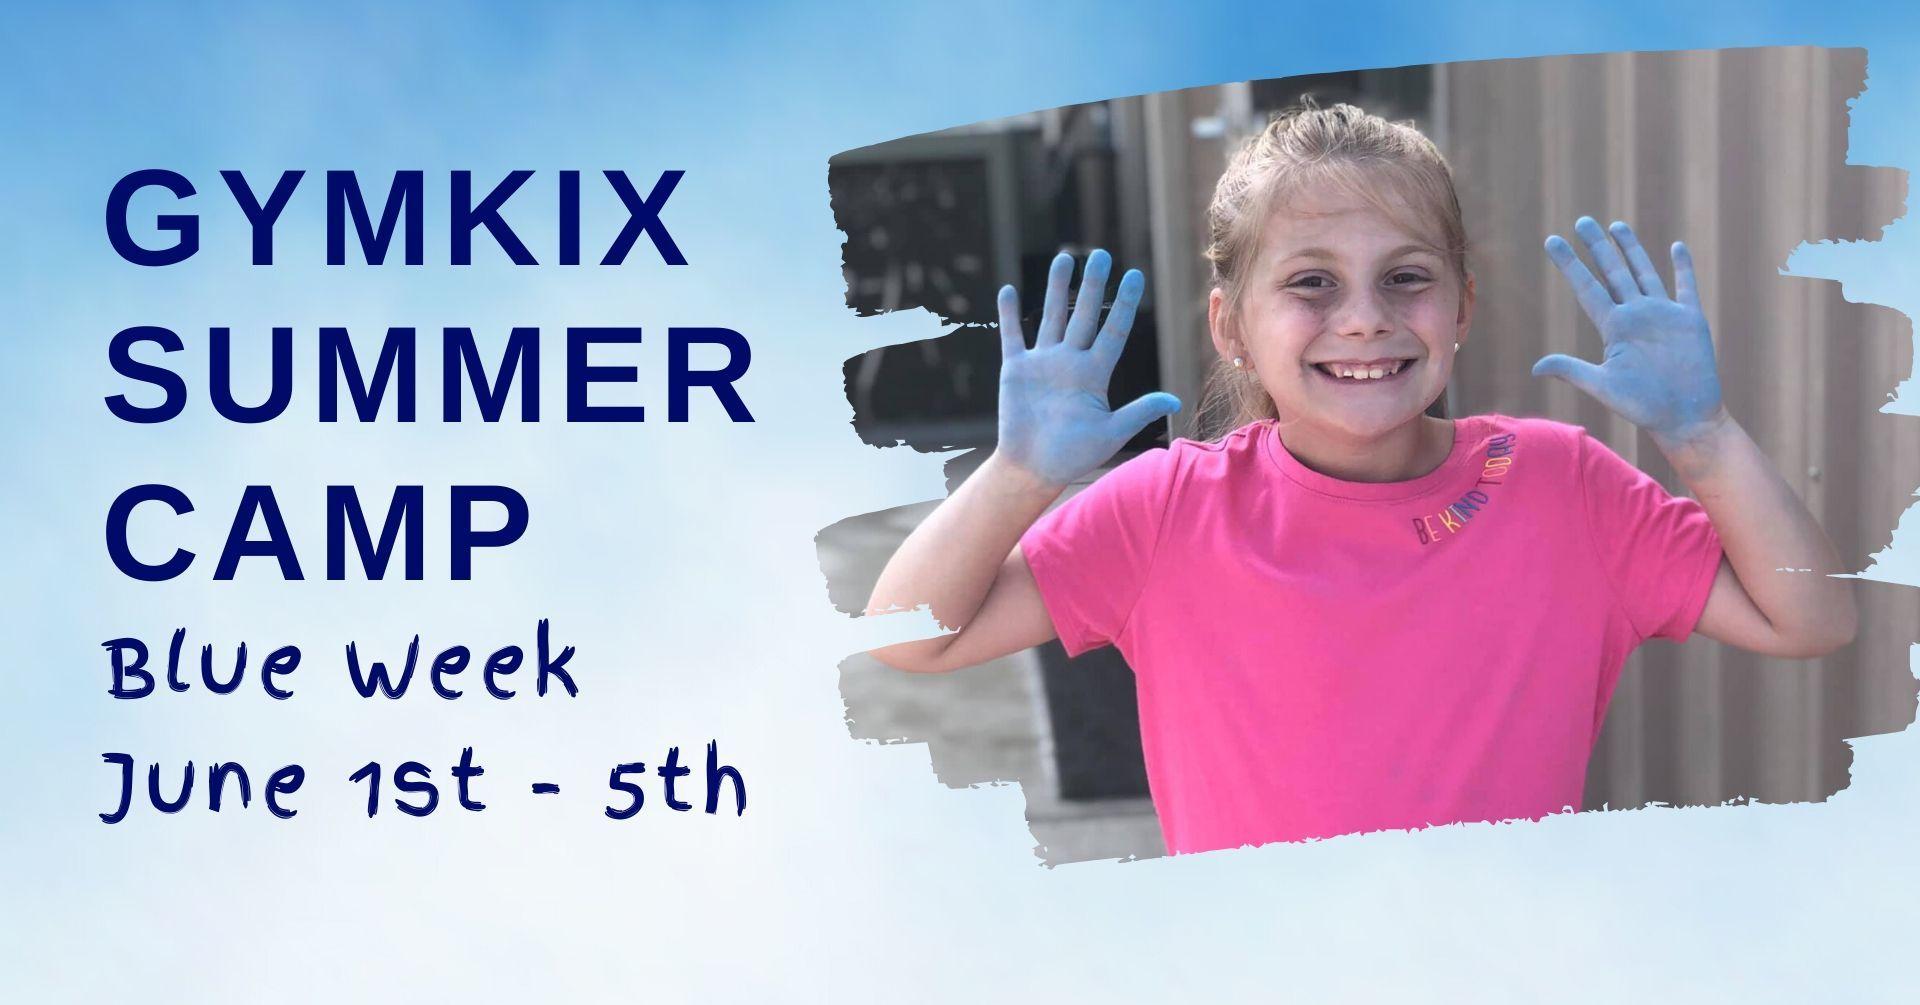 GymKix Summer Camp